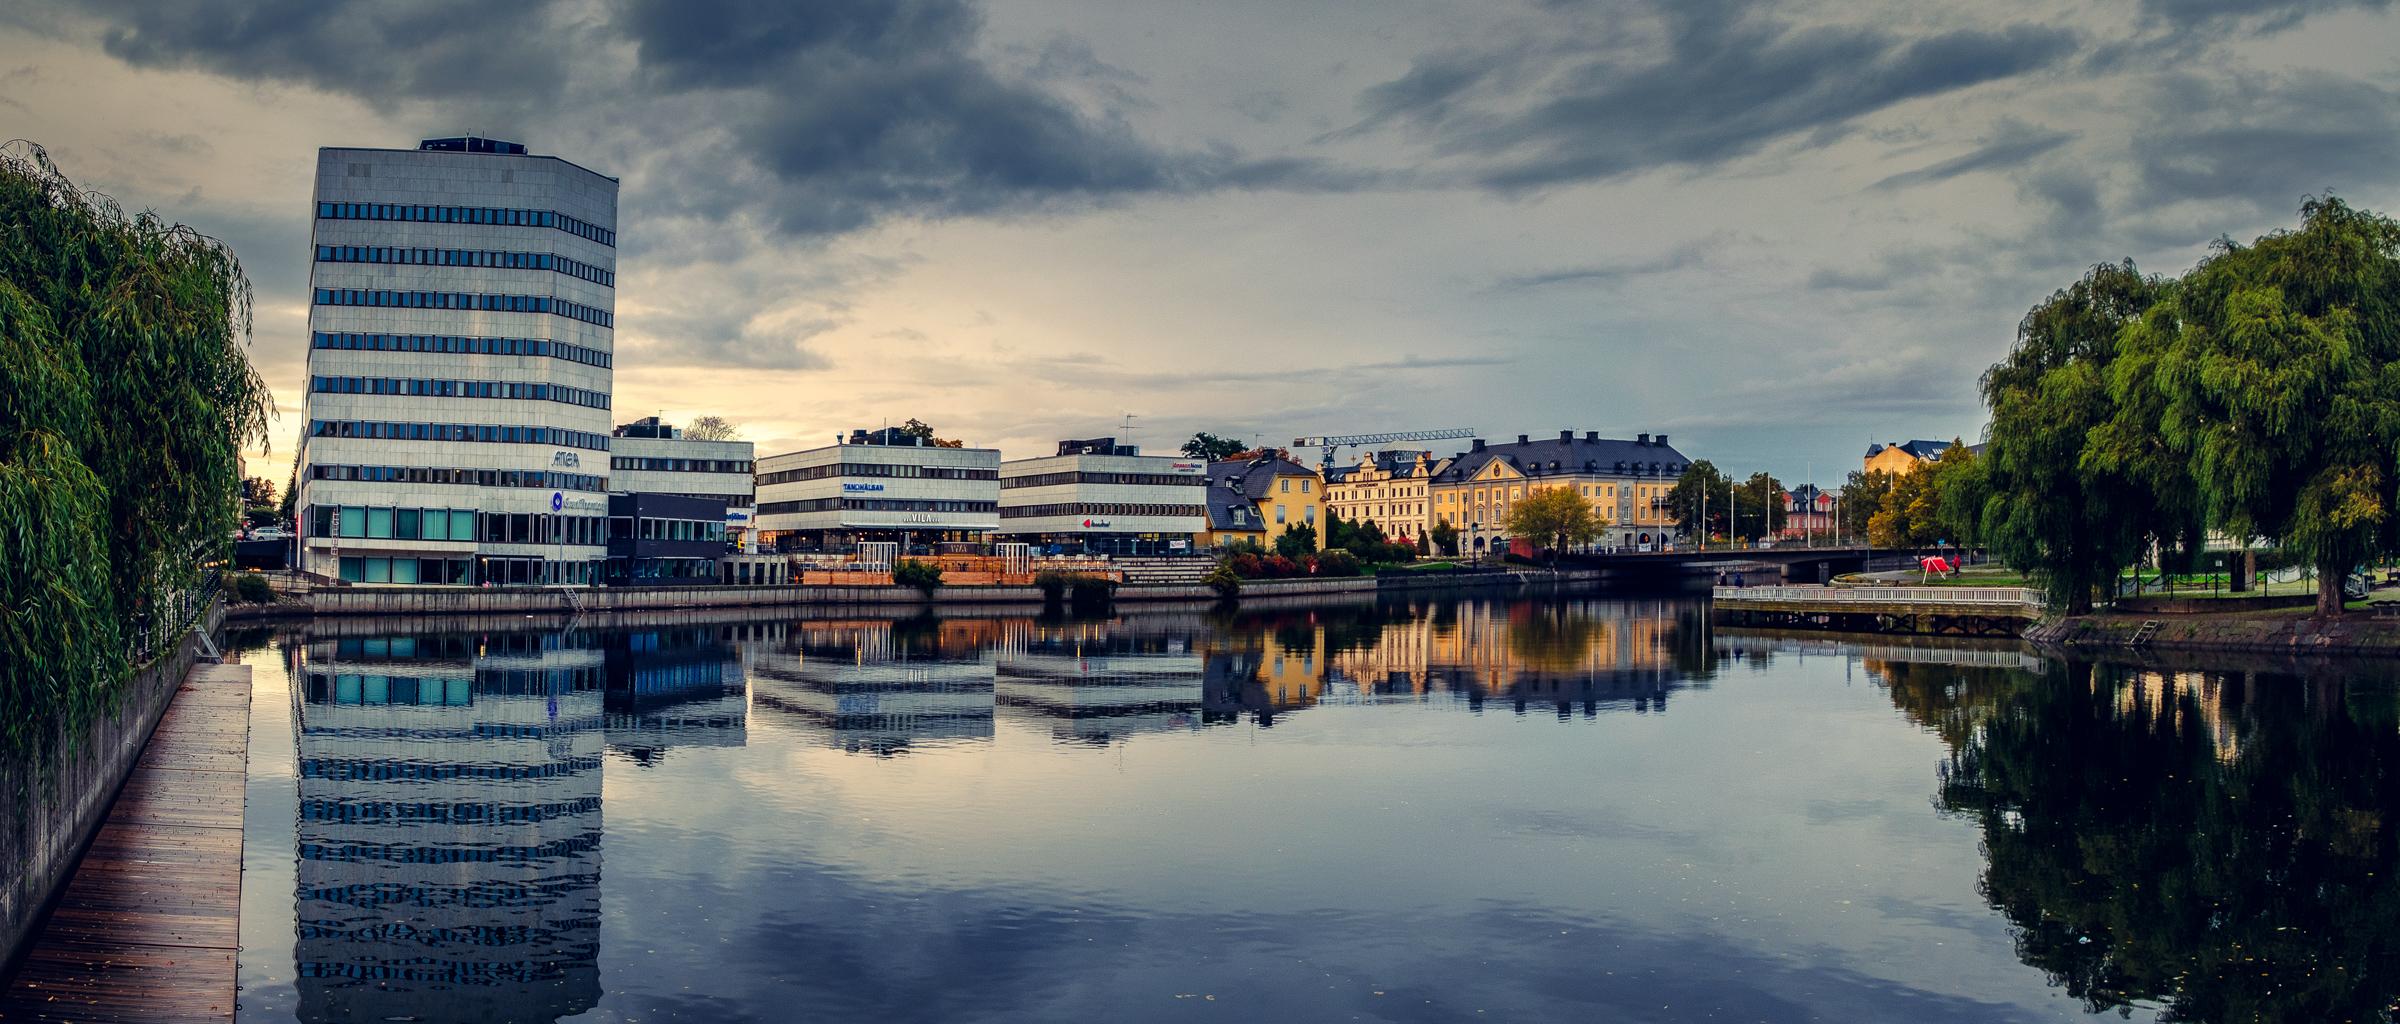 171007-norrköping-photowalk-91-Pano-Redigera.jpg